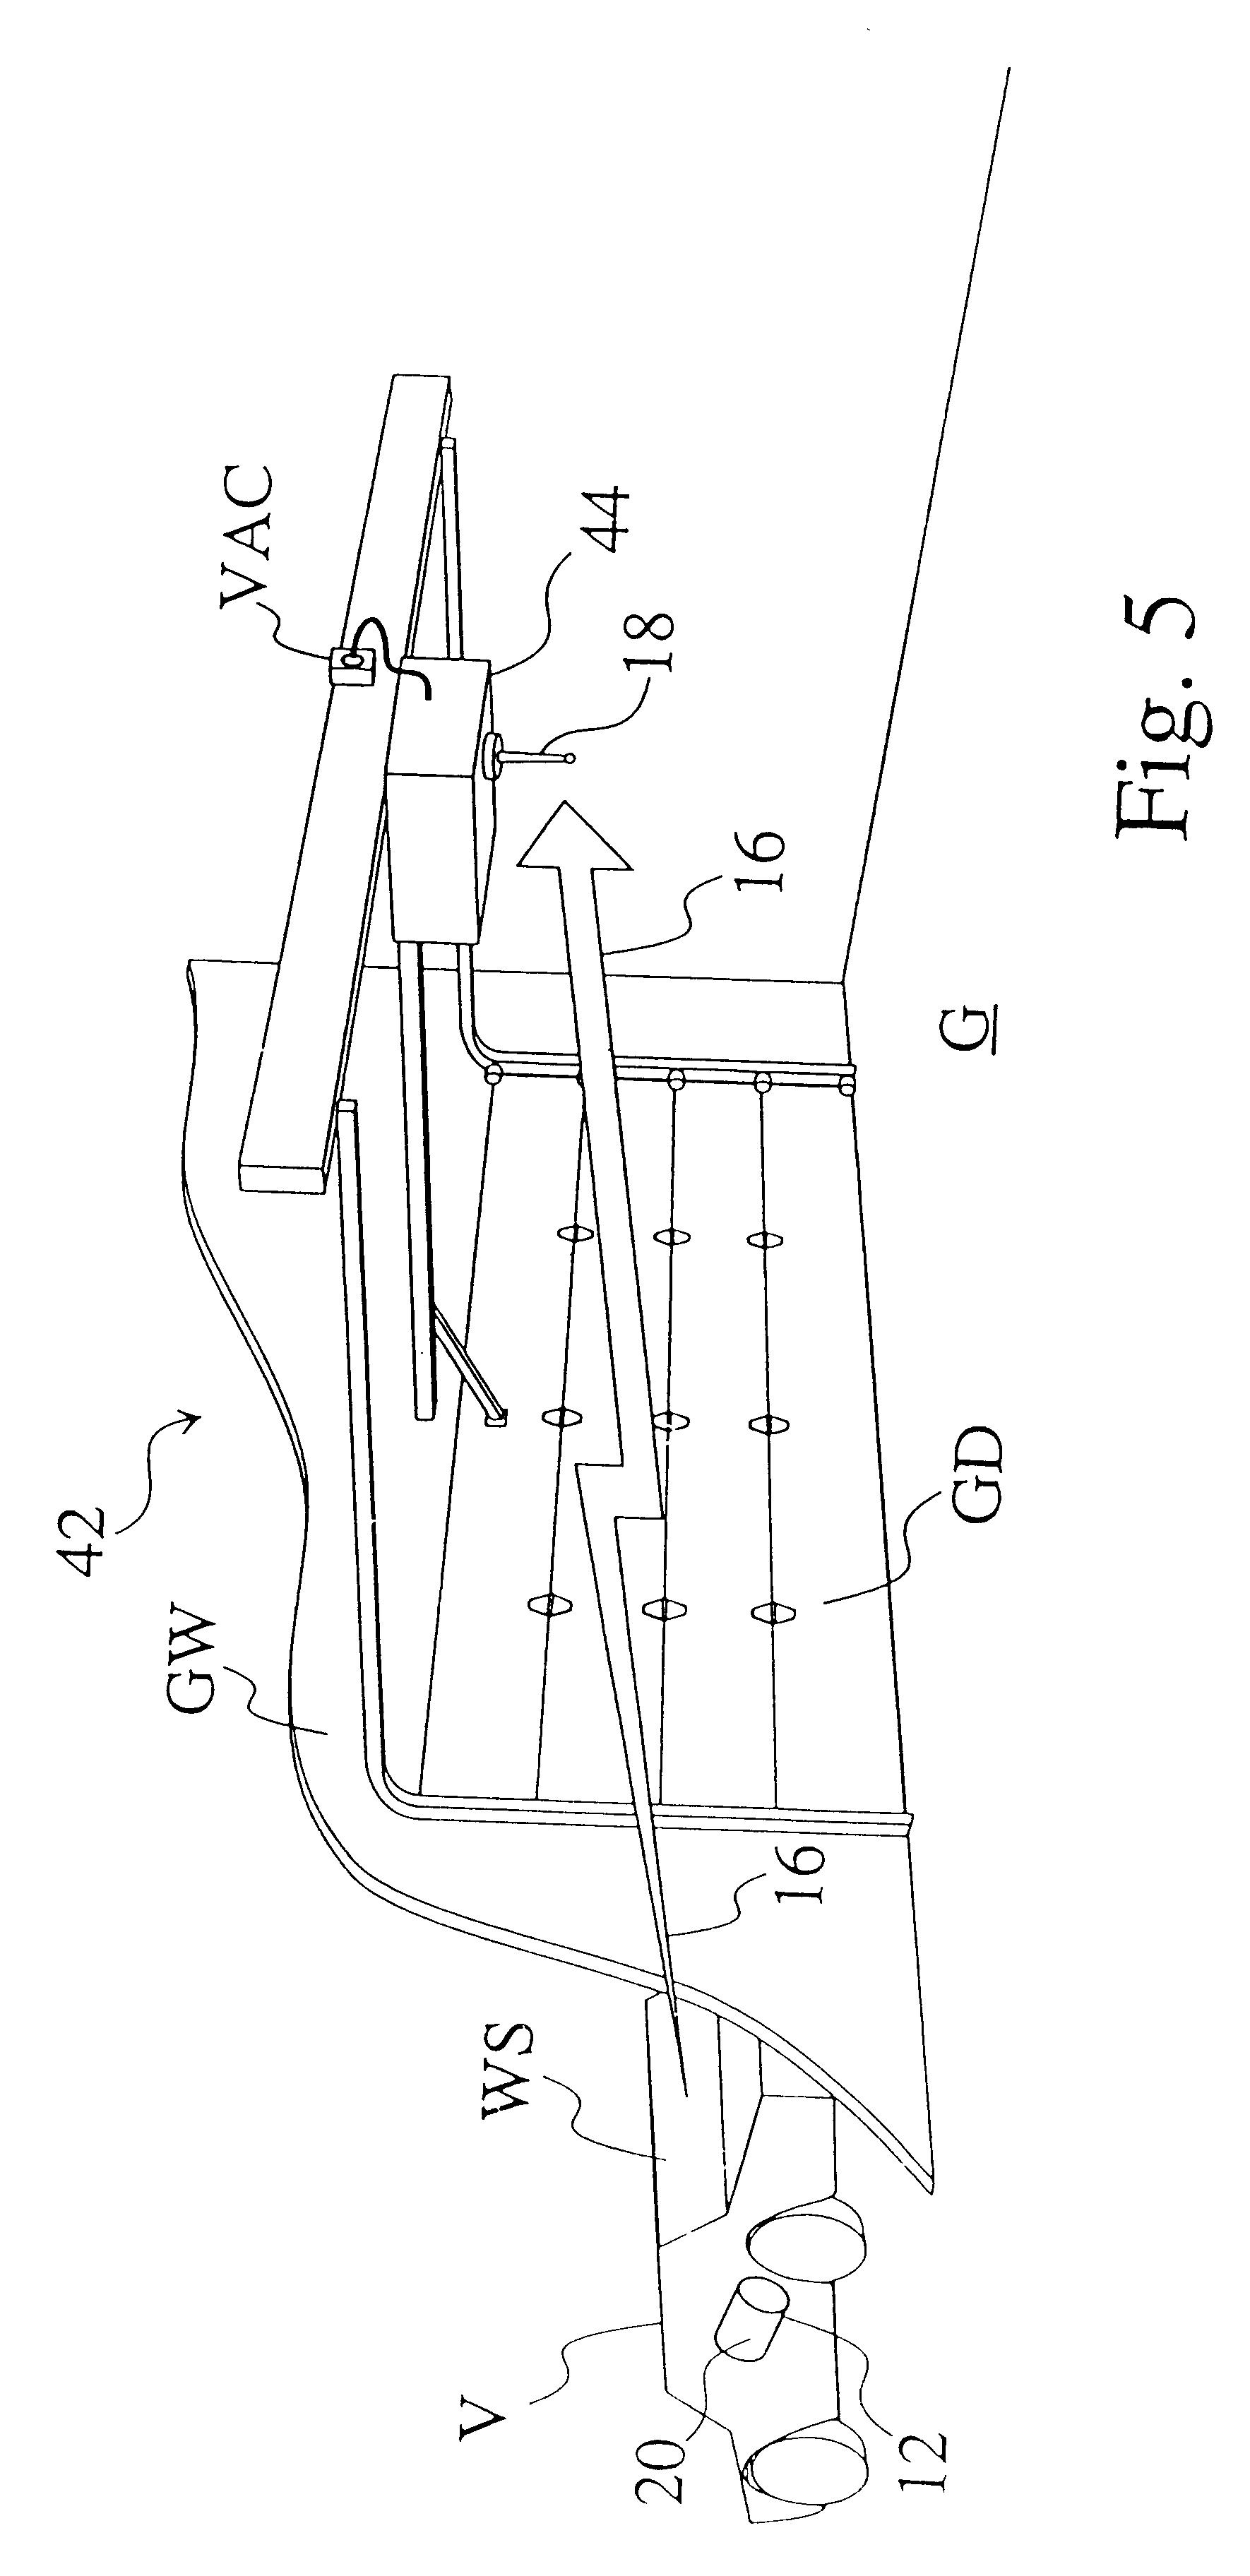 lincoln ln 25 wiring diagram